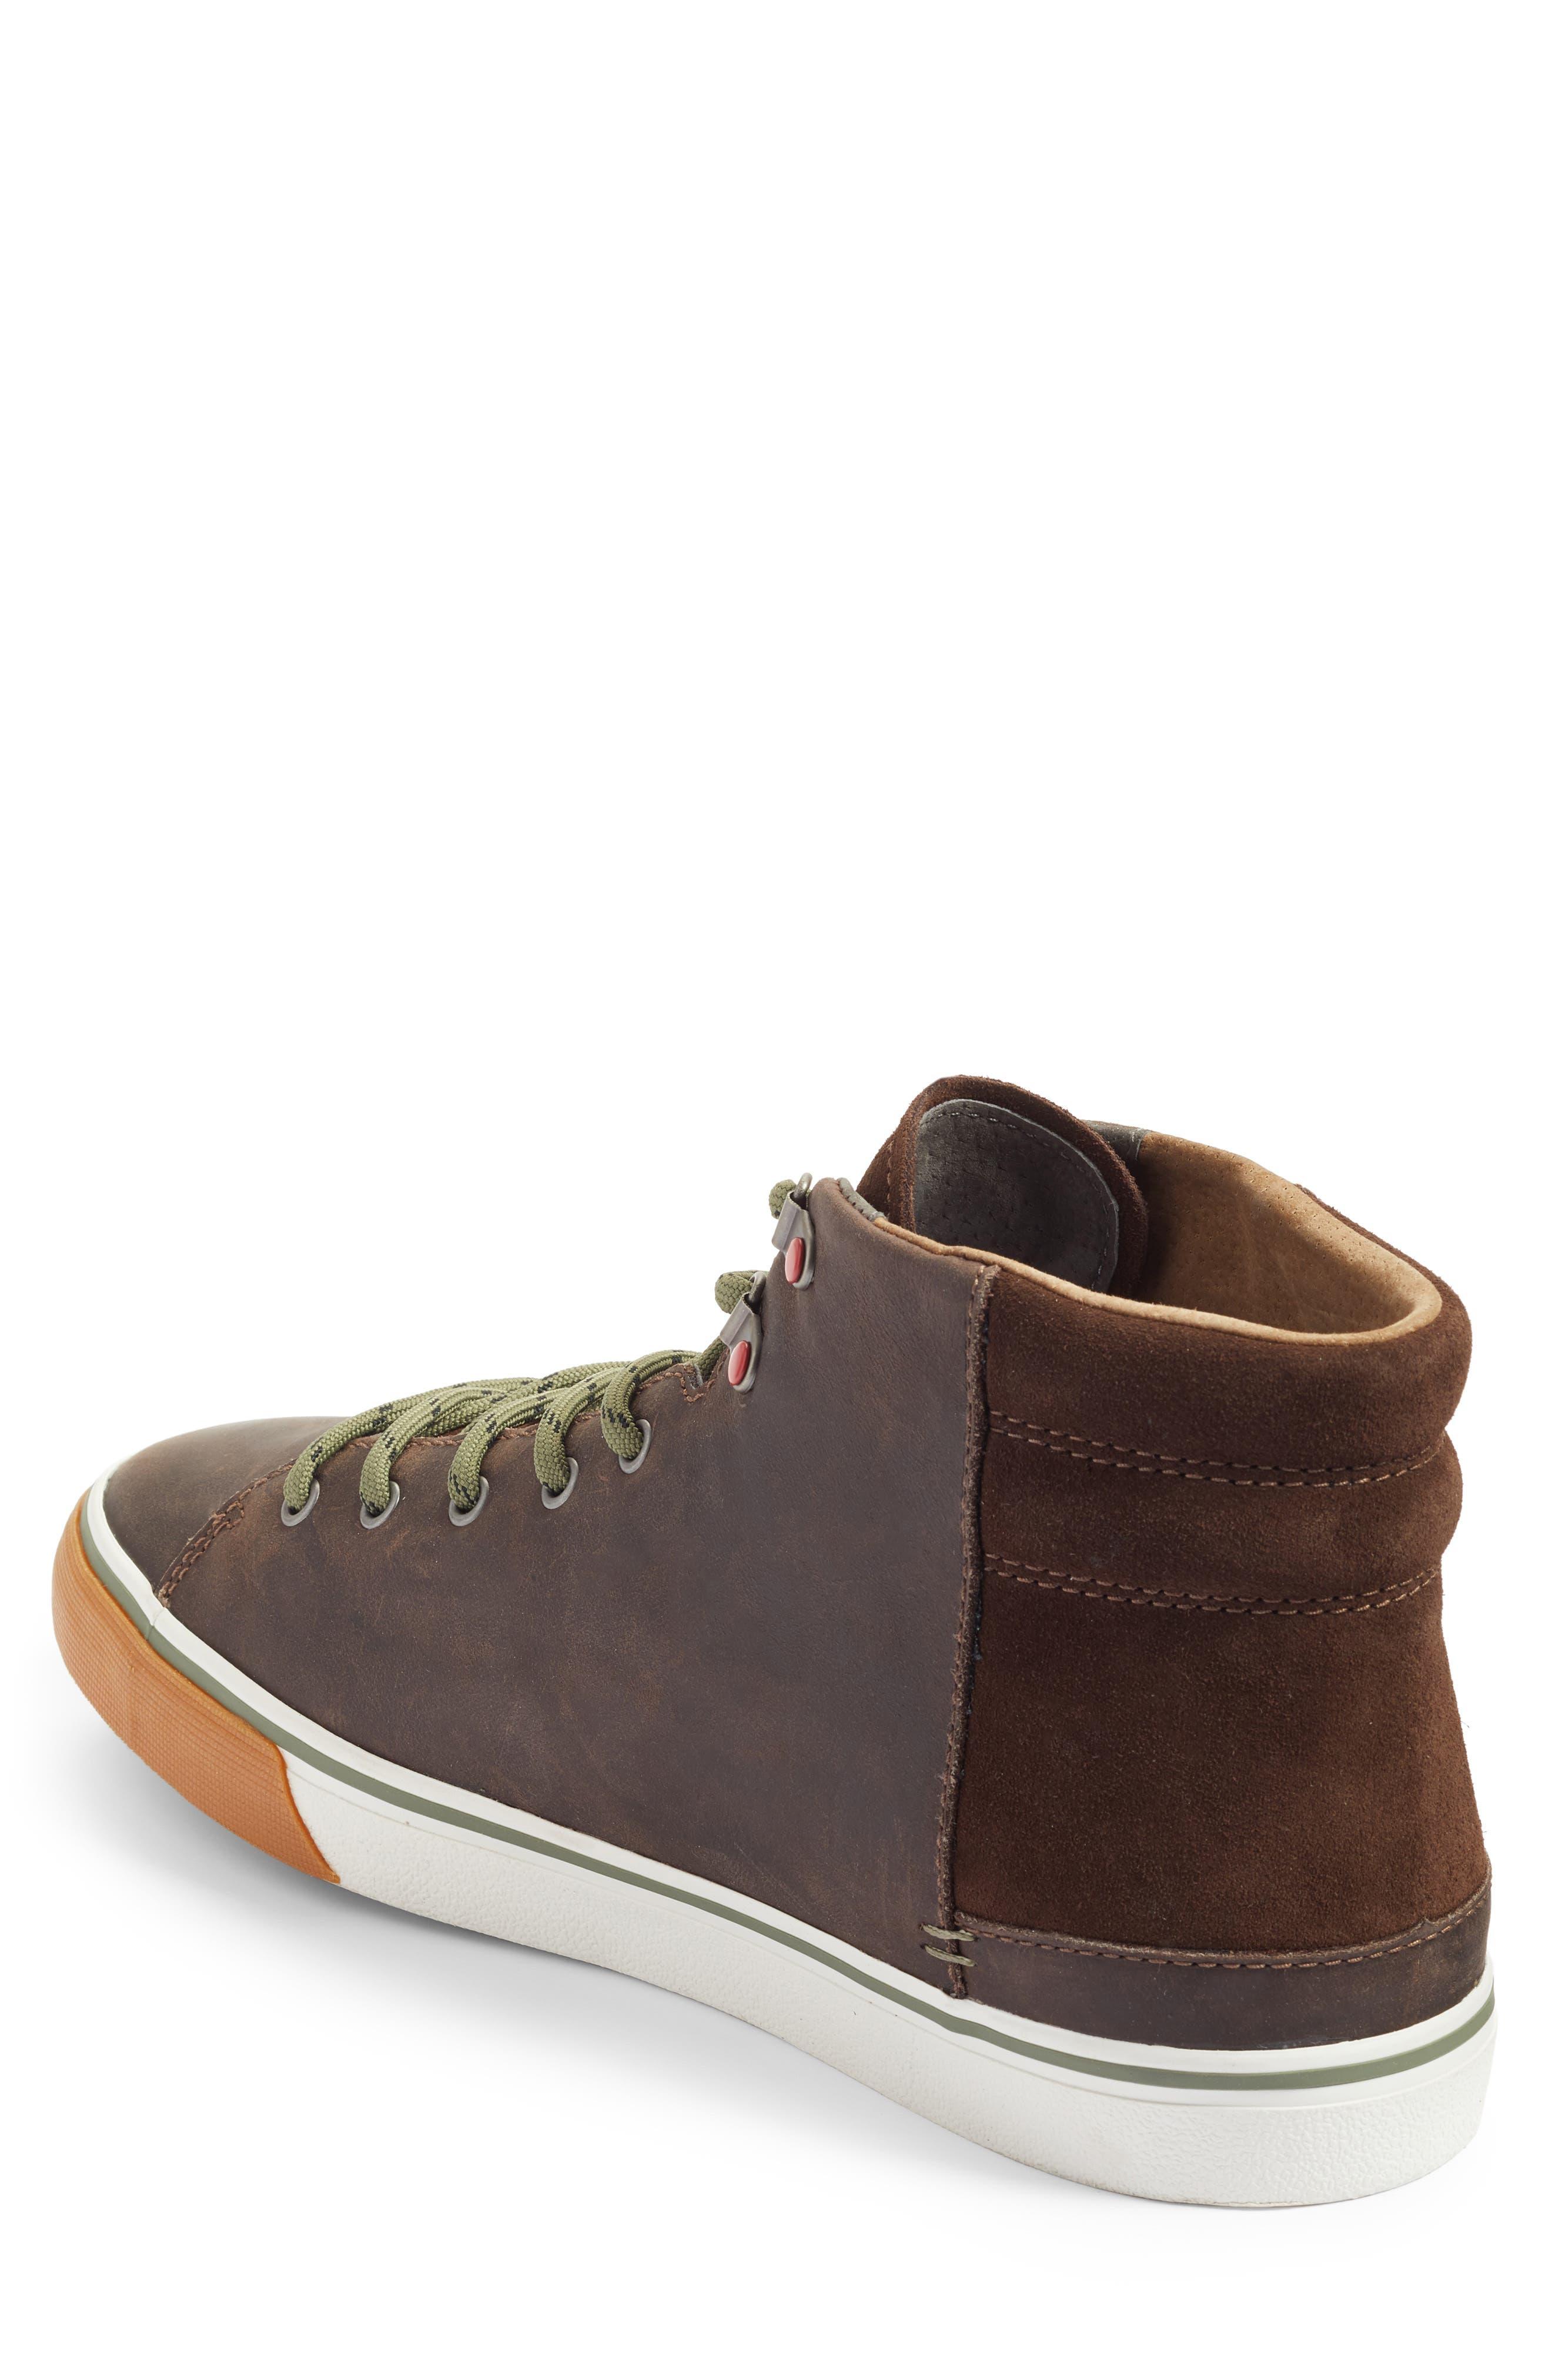 Hoyt High Top Sneaker,                             Alternate thumbnail 4, color,